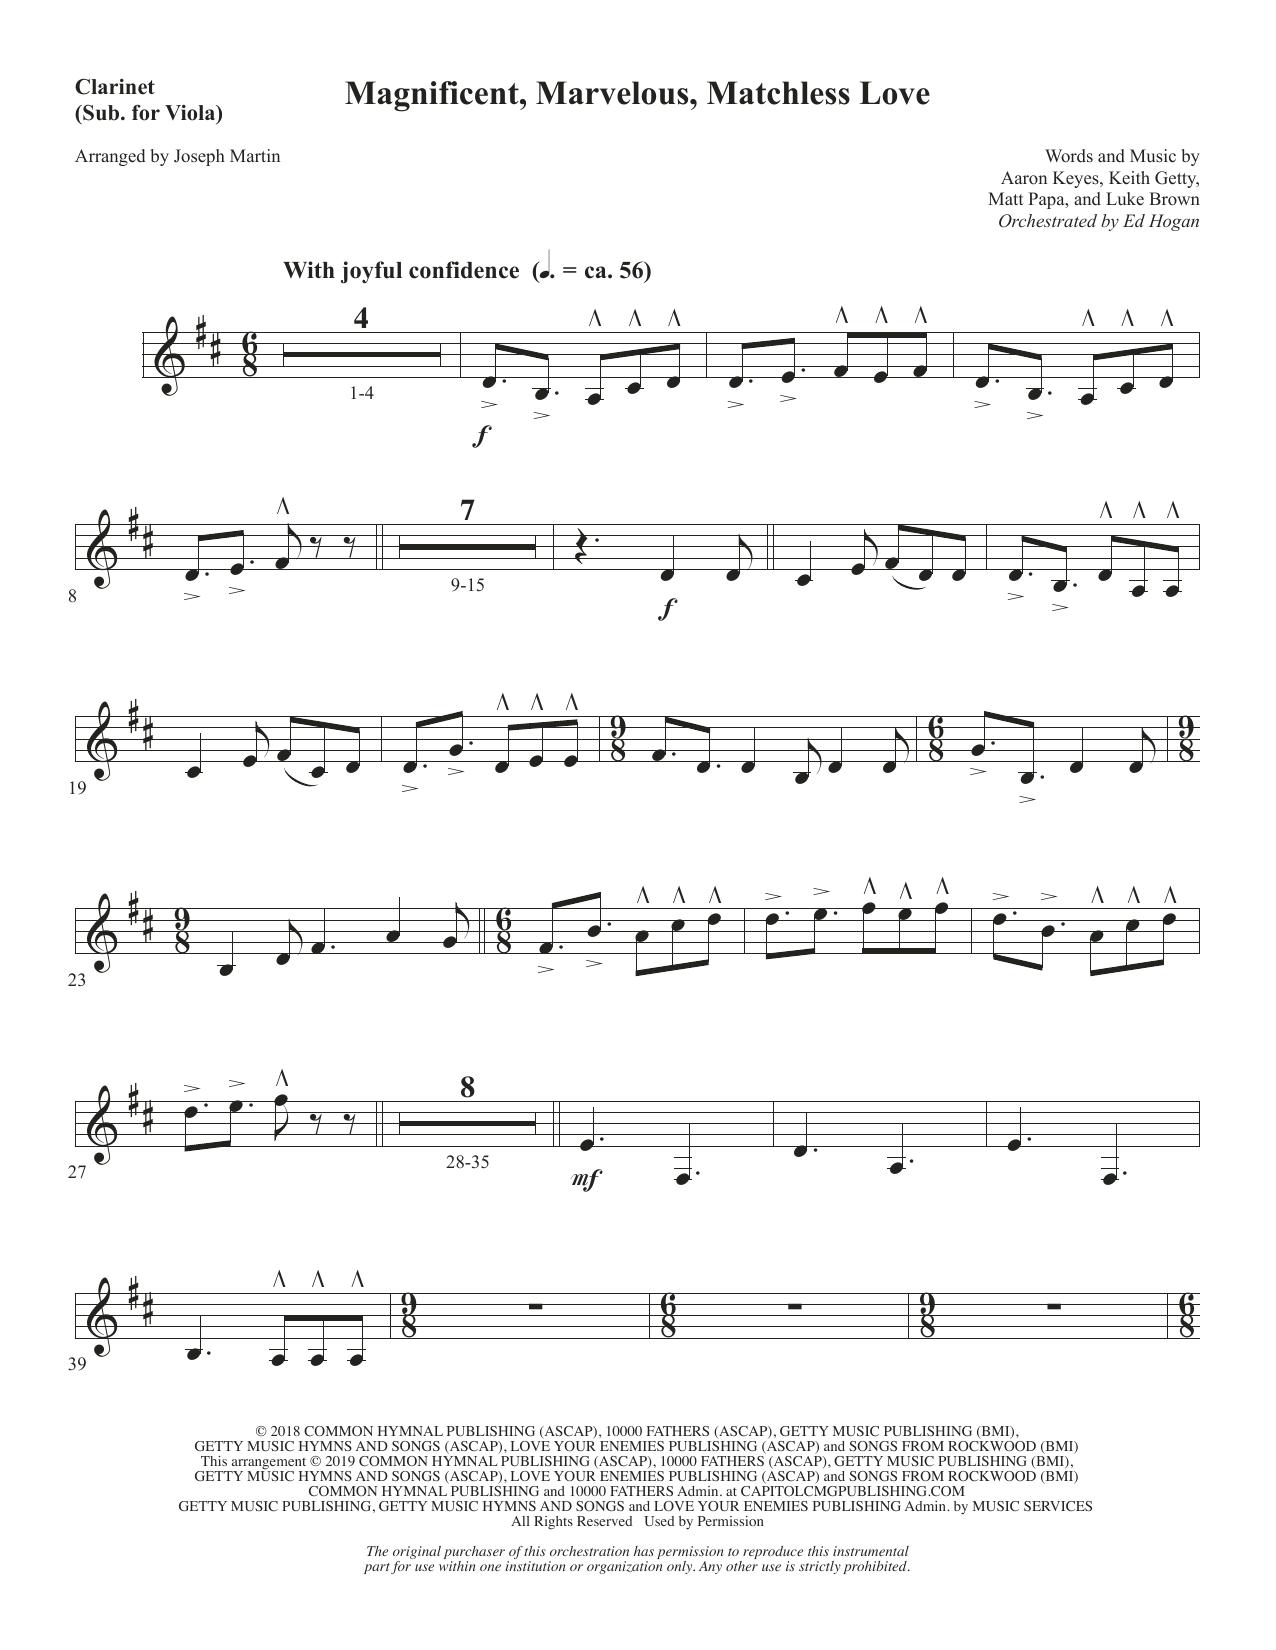 Magnificent, Marvelous, Matchless Love (arr. Joseph M. Martin) - Clarinet (sub. Viola) (Choir Instrumental Pak)